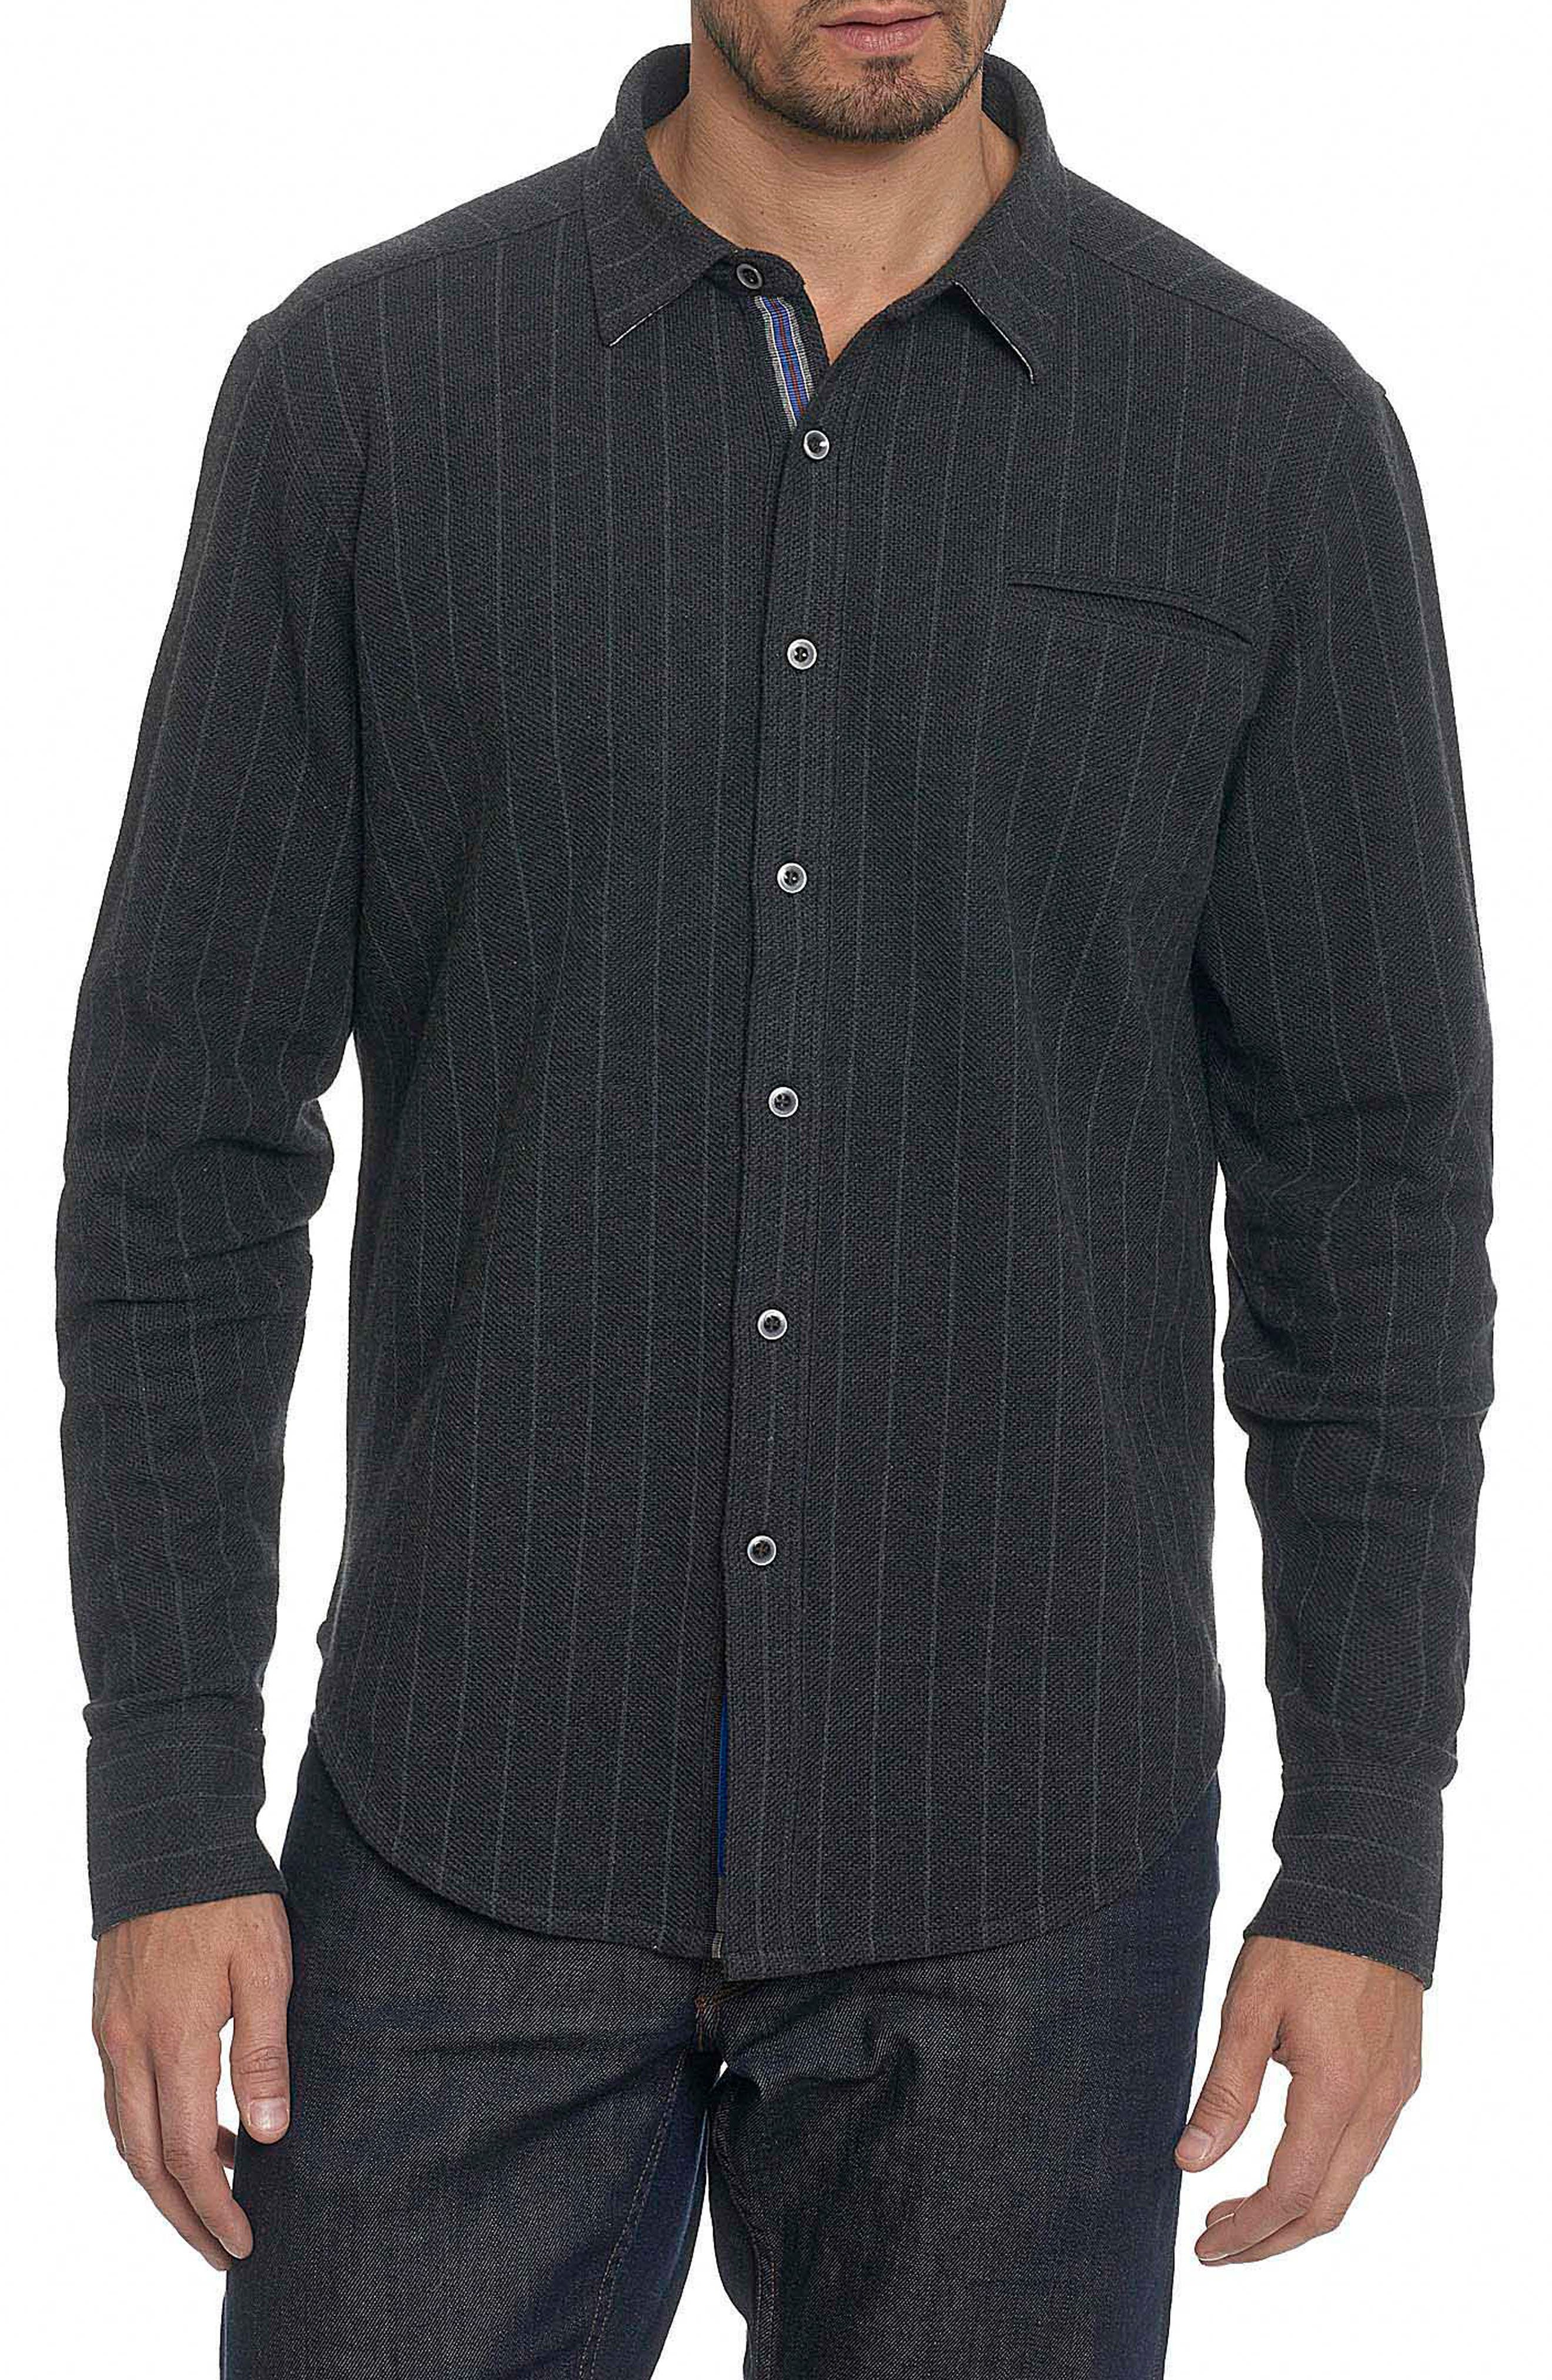 Main Image - Robert Graham Amboy Classic Fit Shirt Jacket